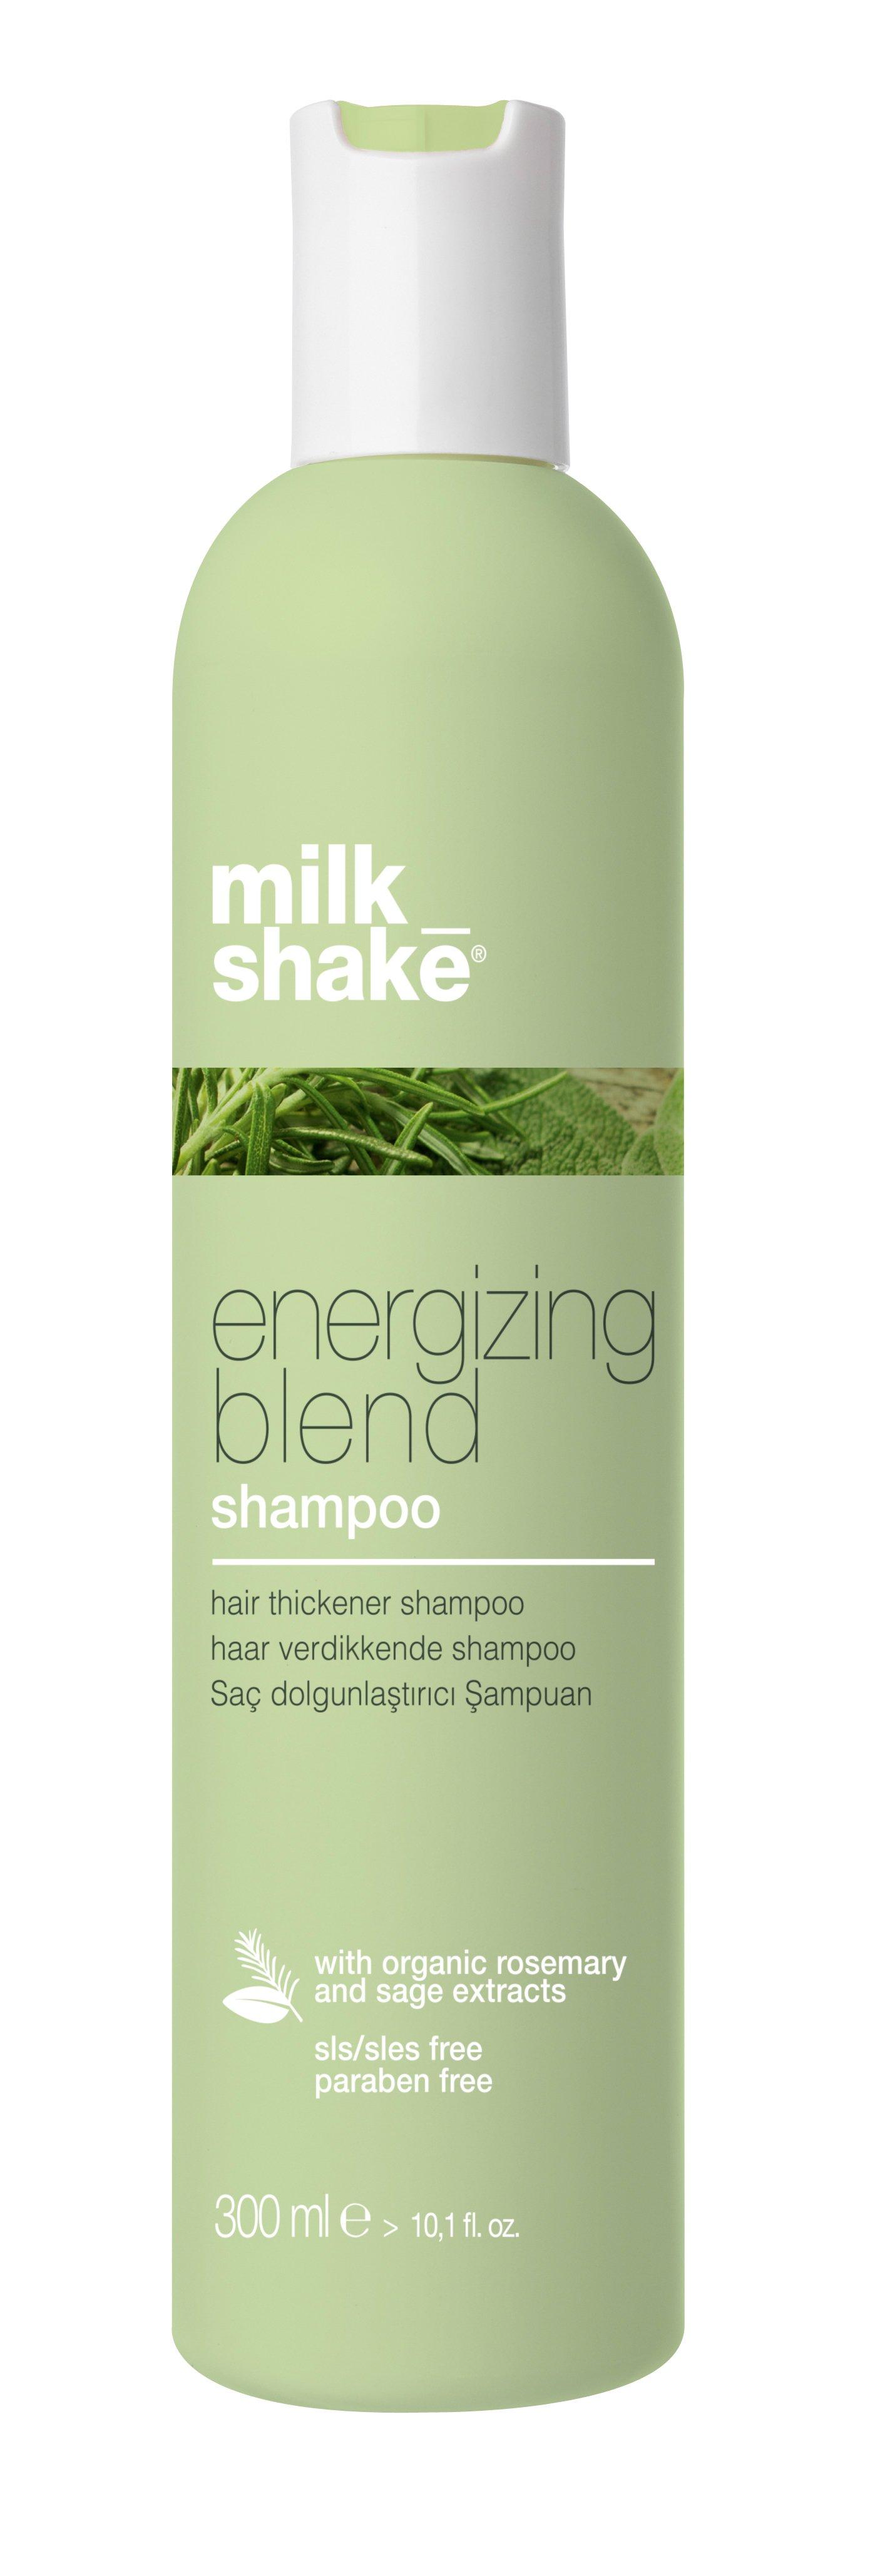 milk_shake - Energizing Blend Shampoo 300 ml